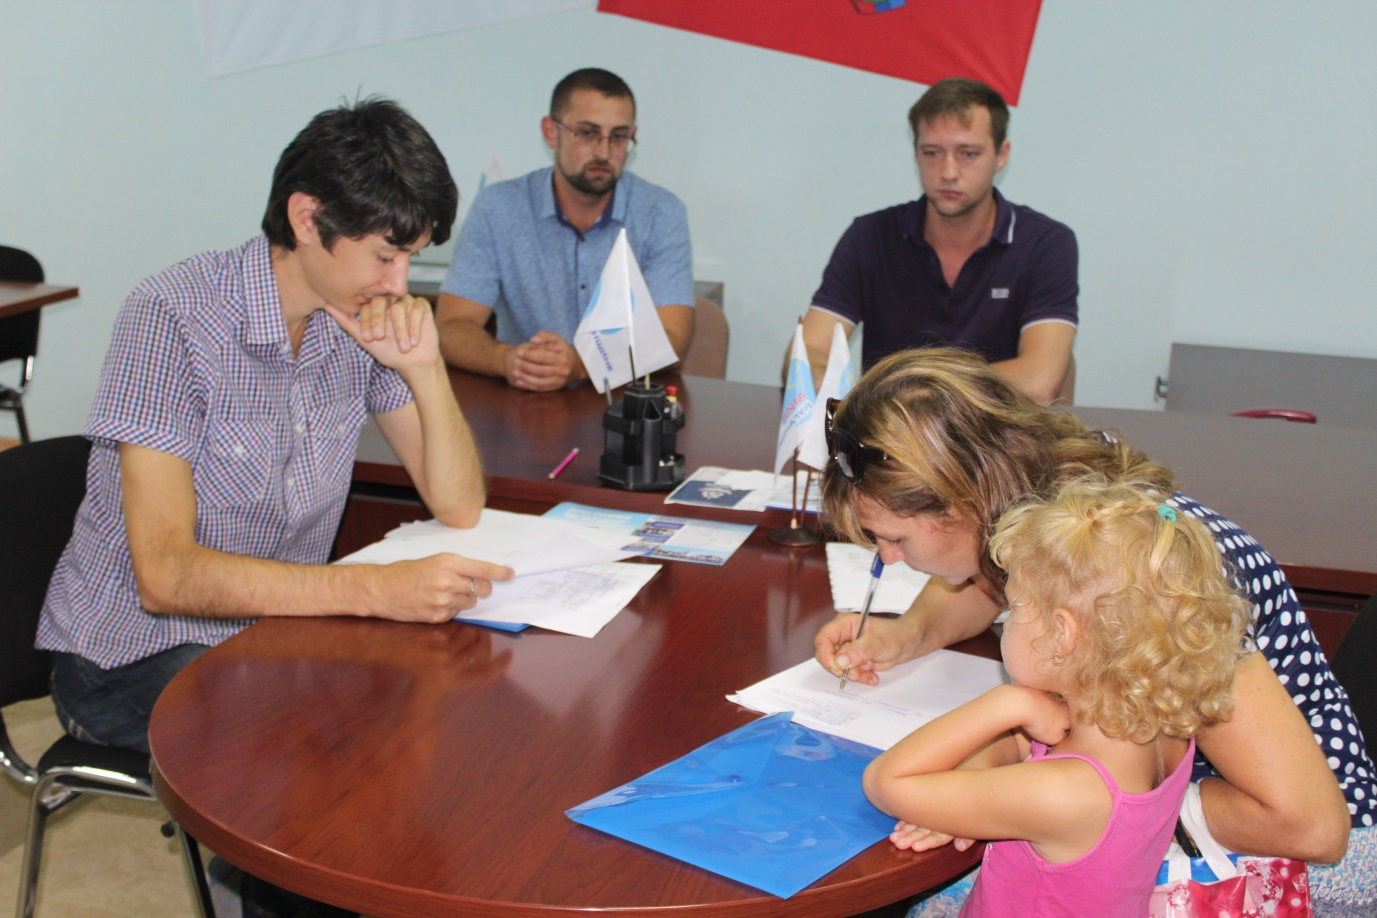 Помощники депутата Народного Совета ЛНР провели прием граждан в Славяносербске 1